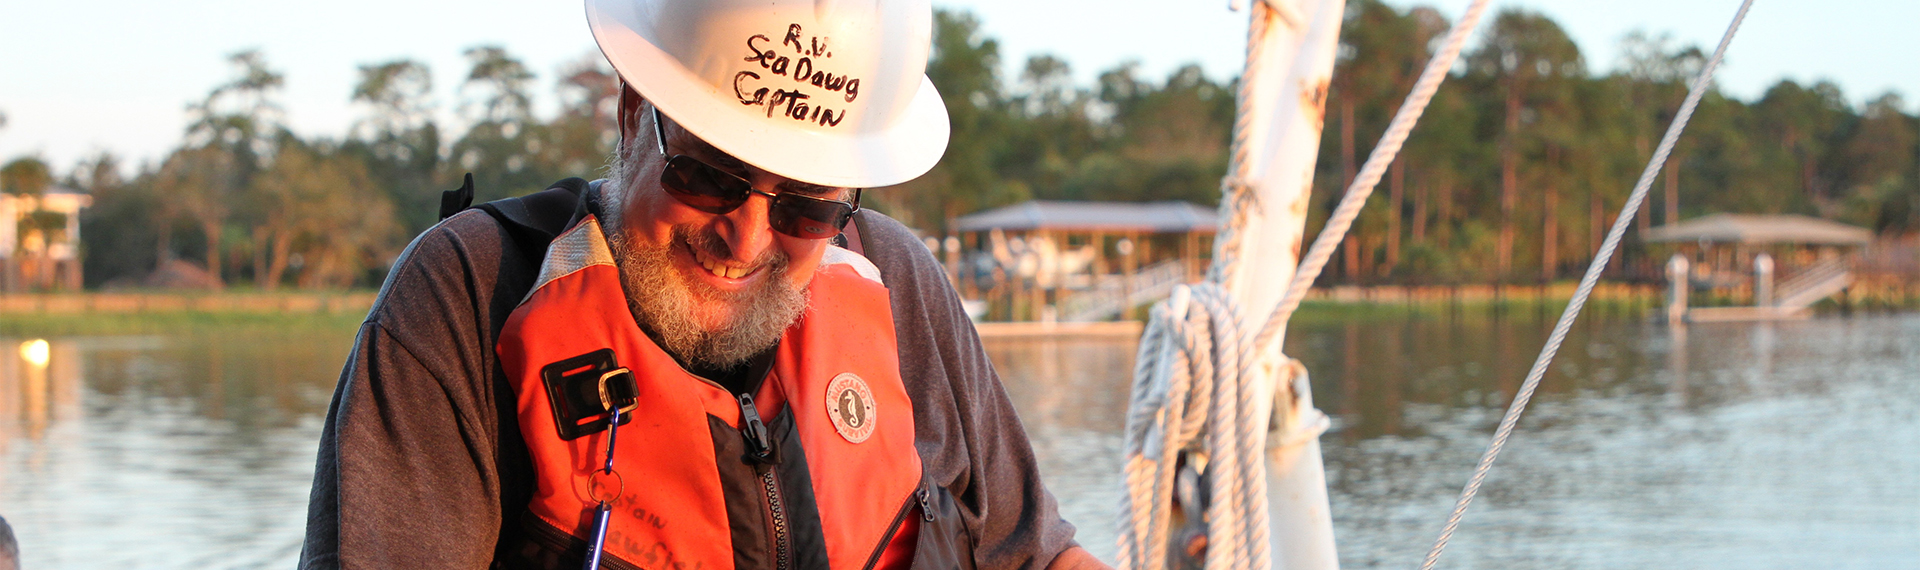 "John ""Crawfish"" Crawford wearing a hard hat and life jacket aboard a boat."